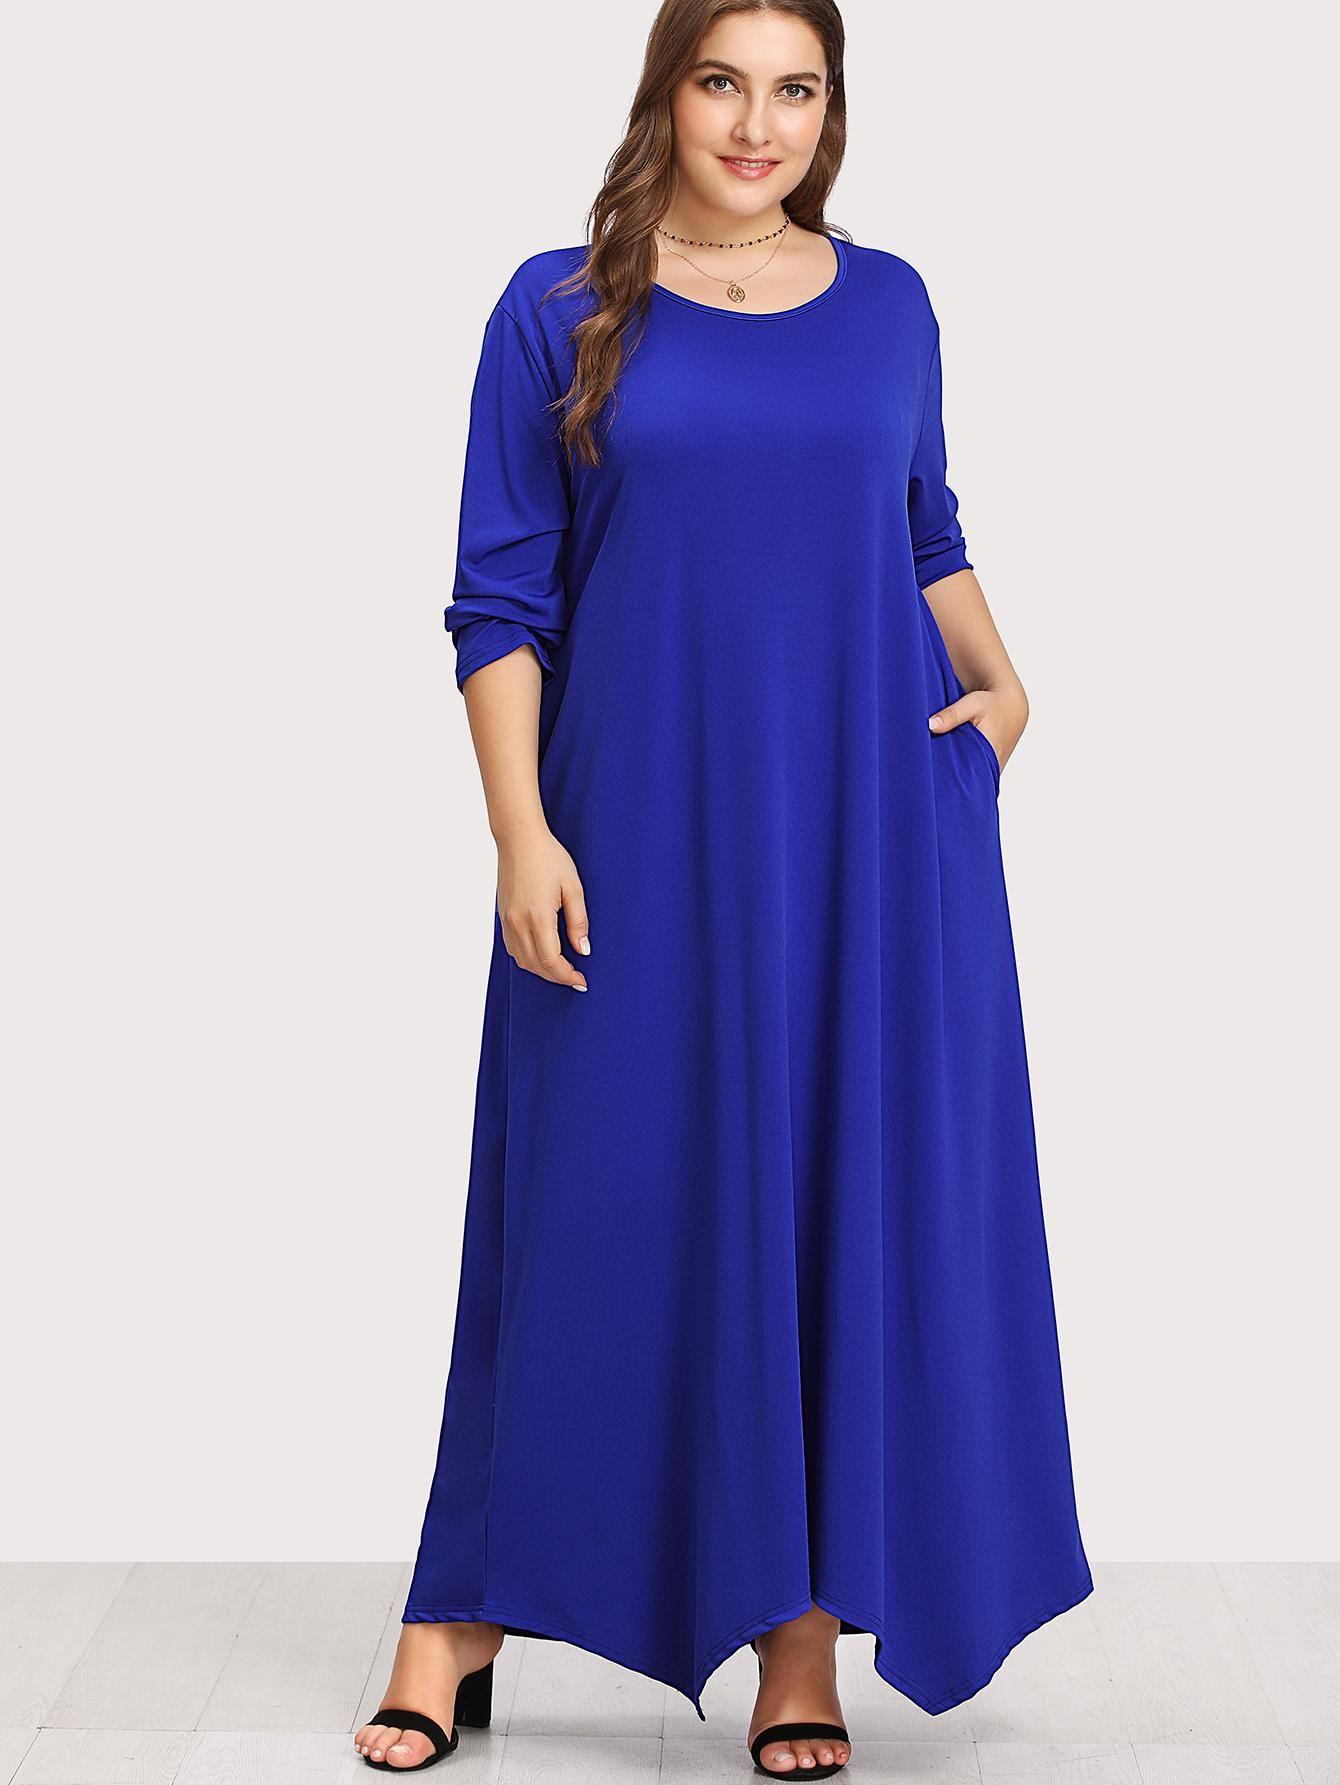 390cd276f8 #Spring #AdoreWe #SheIn - #SheIn Long Sleeve Solid Maxi Dress - AdoreWe.com